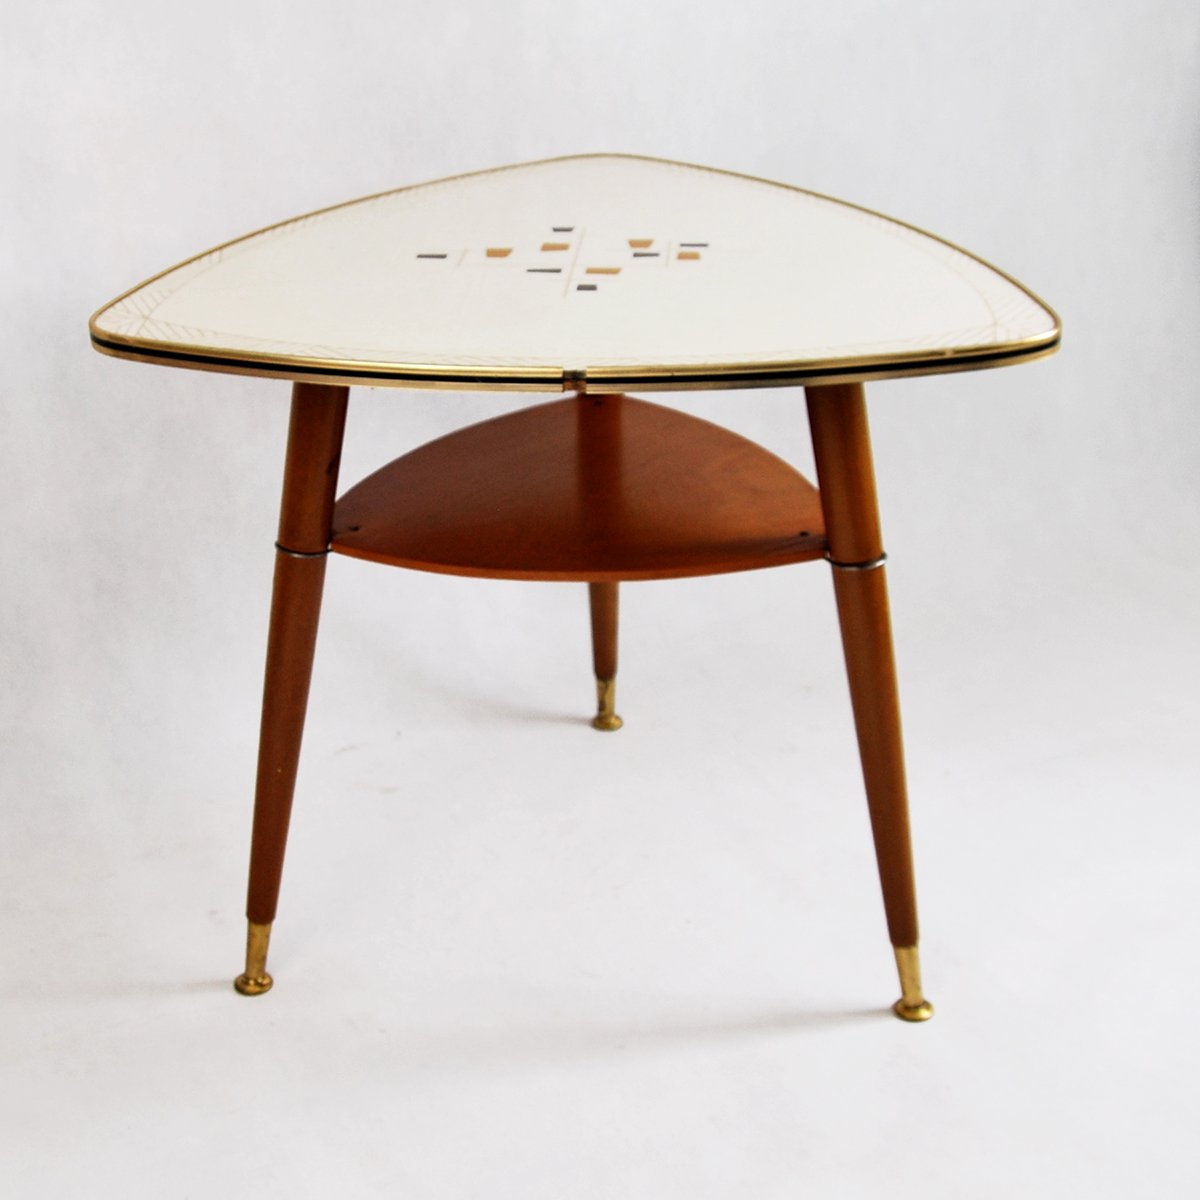 Triangular German Coffee Table 1960s For Sale At Pamono